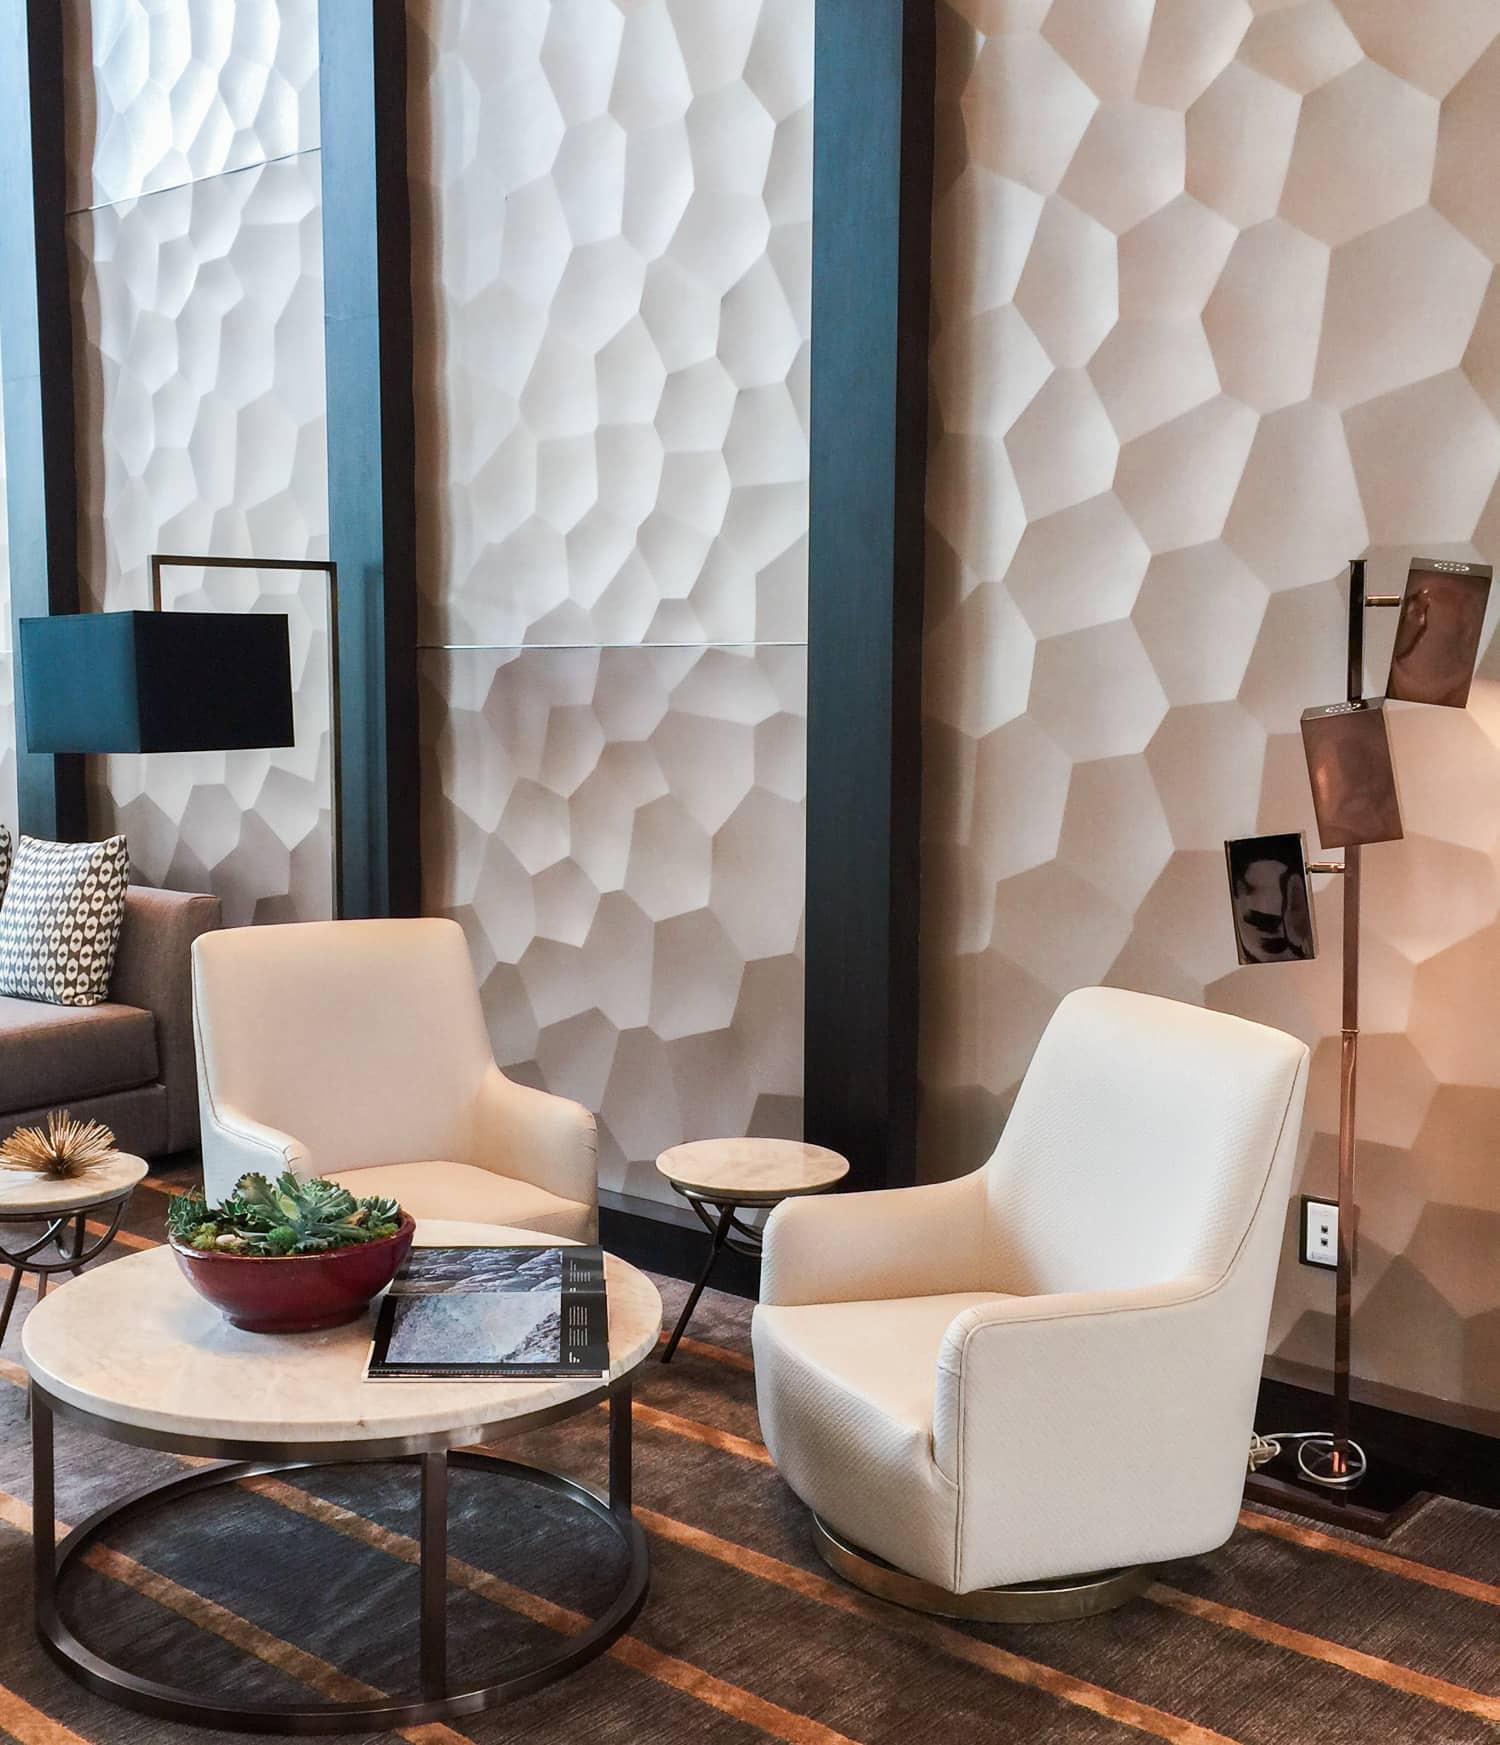 west palm beach hotel review ashley brooke nicholas